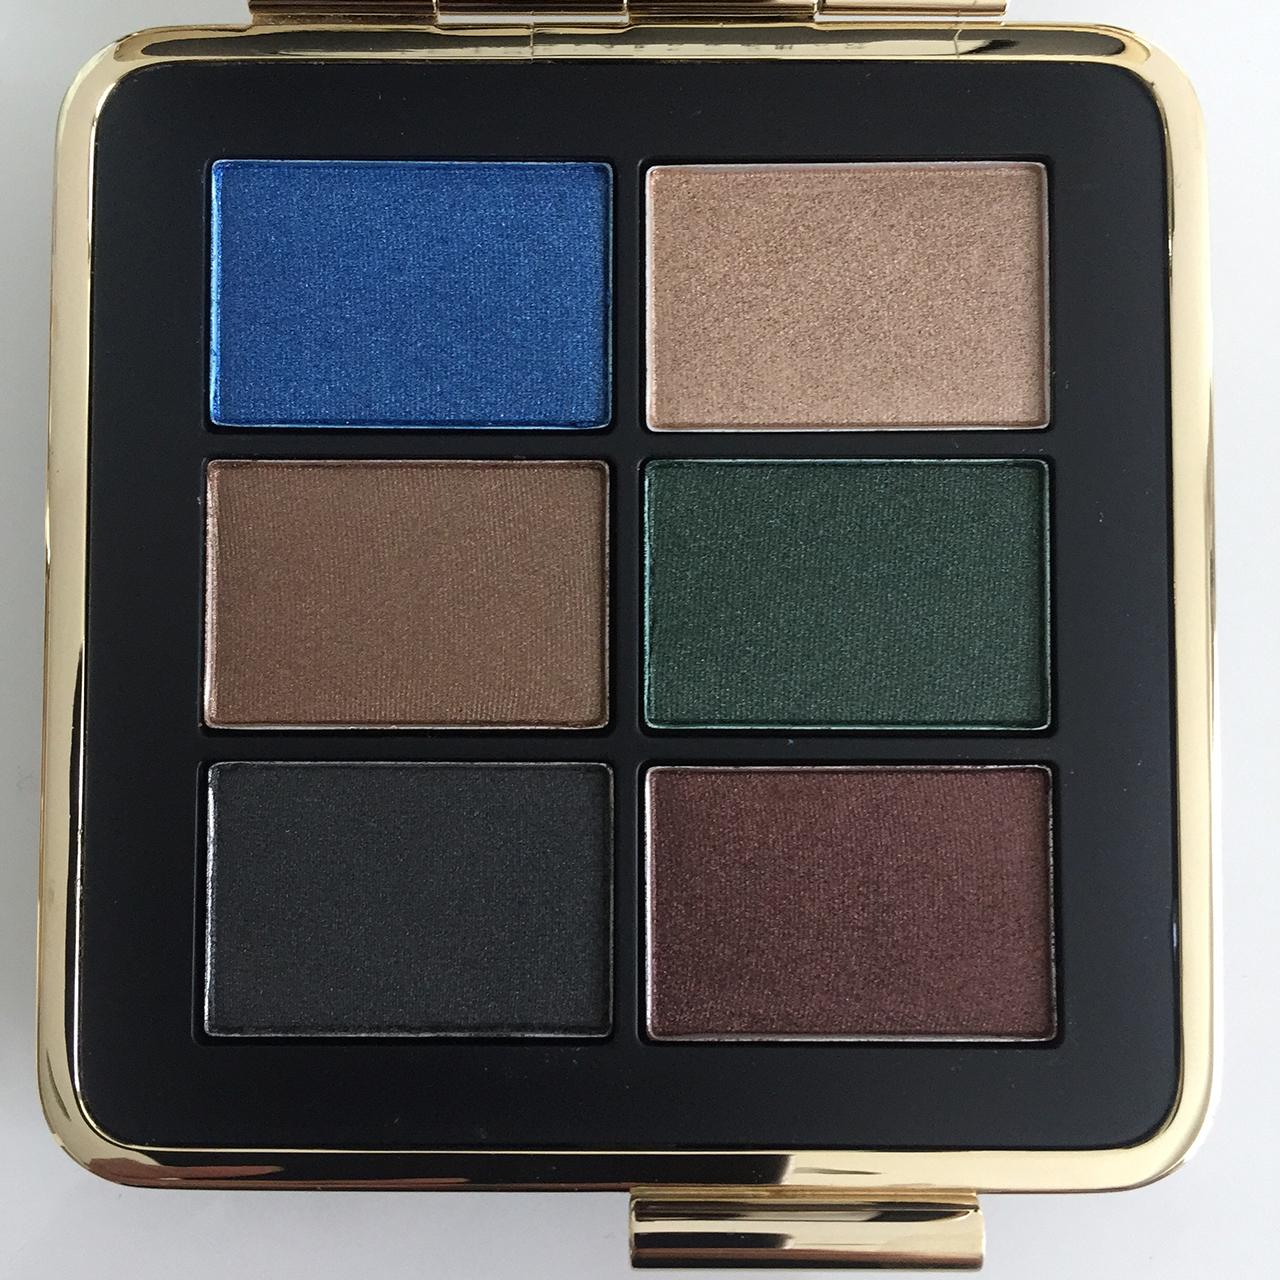 victoria-beckham-x-estee-lauder-eye-palette-closeup